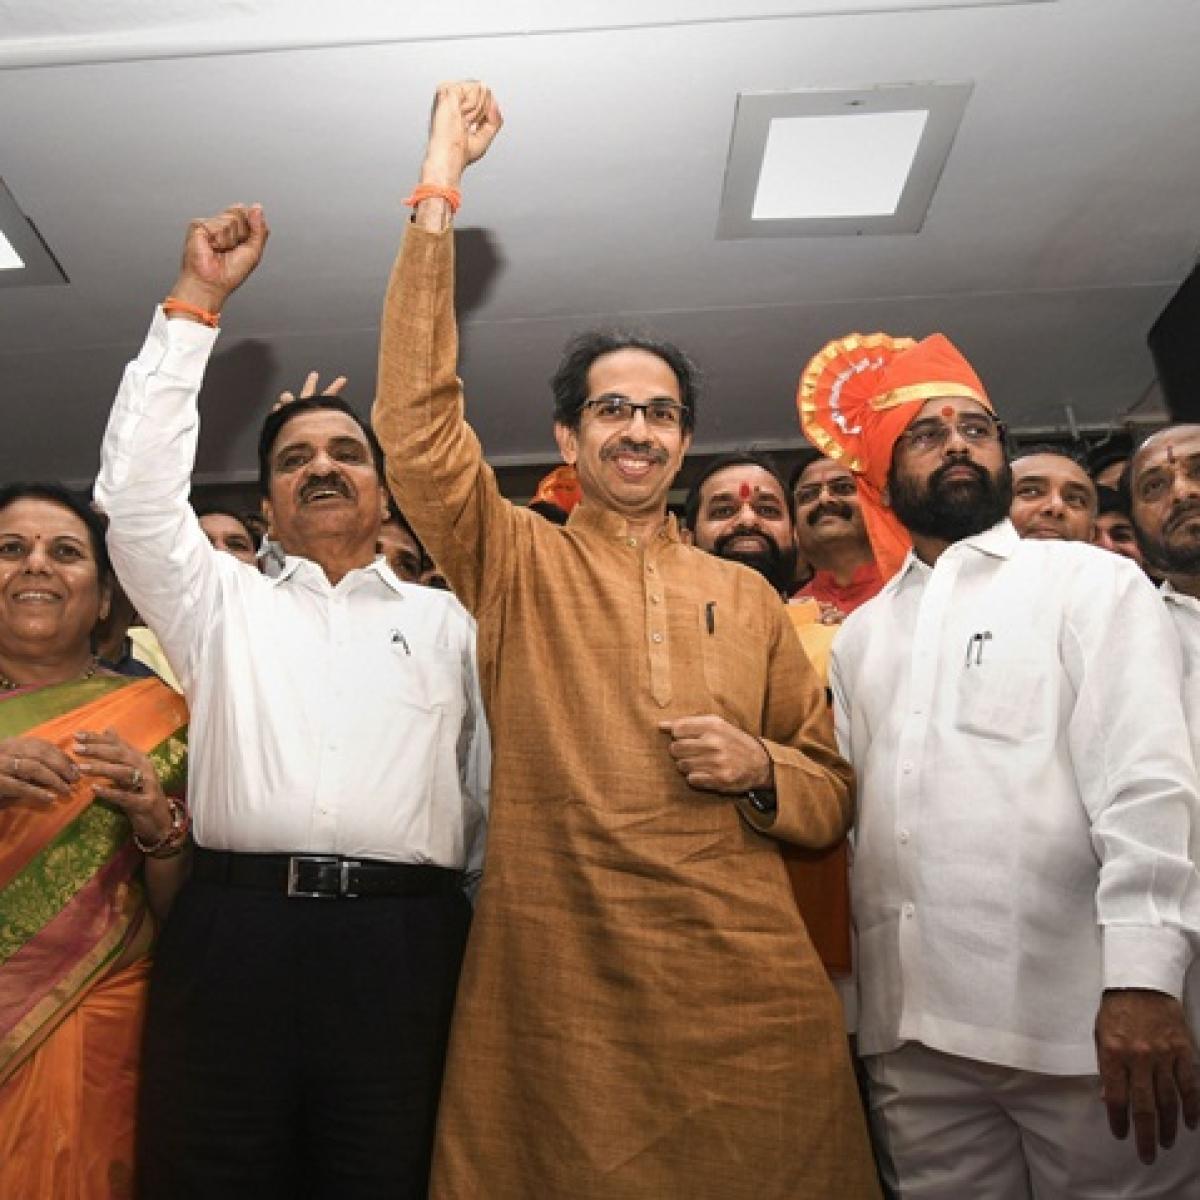 Meet 5 key individuals who will help Uddhav Thackeray run govt and handle coalition